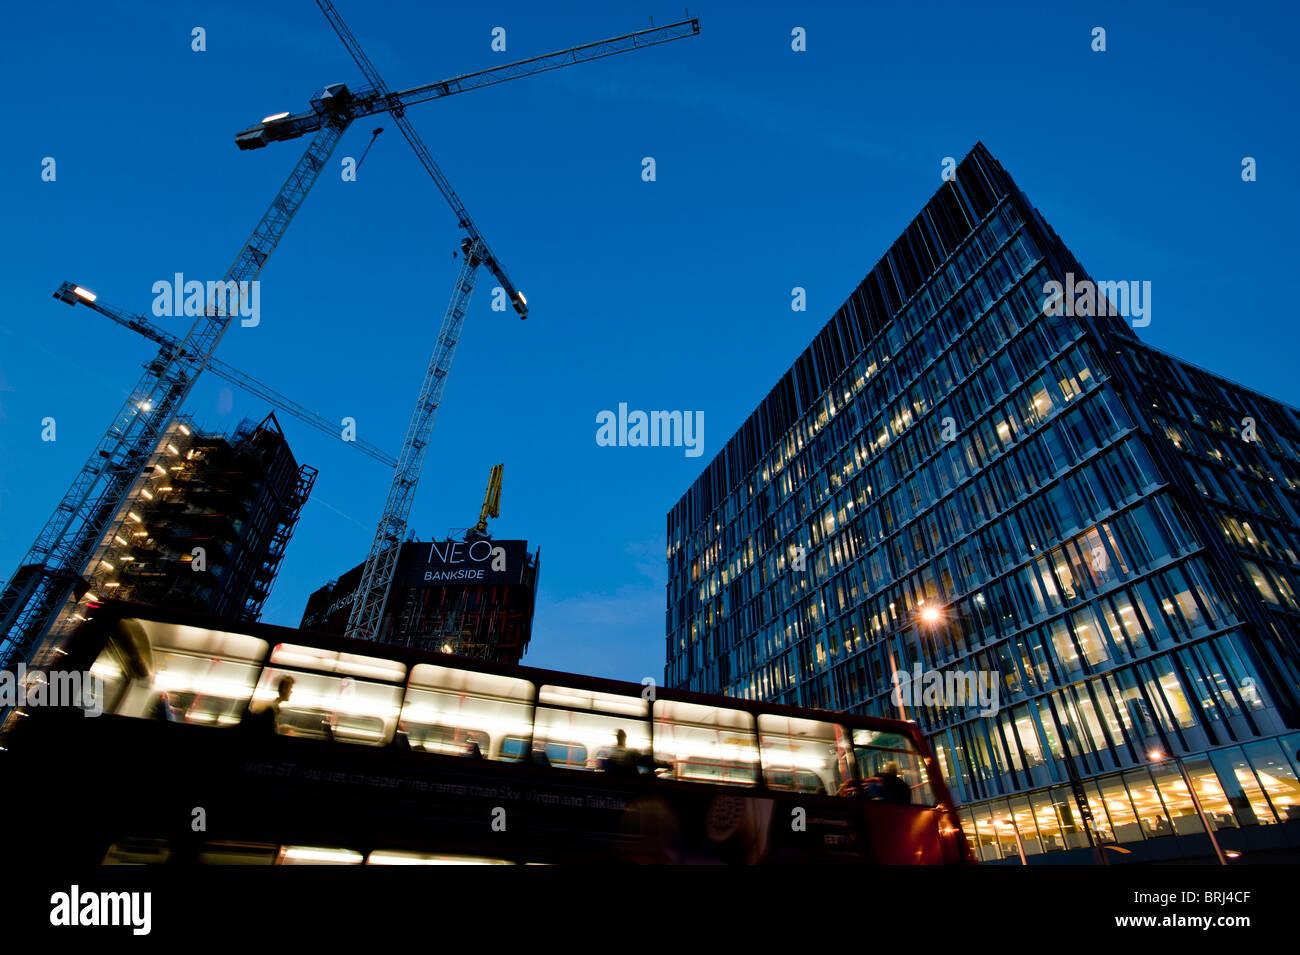 NEO Bankside modern development, London, United Kingdom - Stock Image